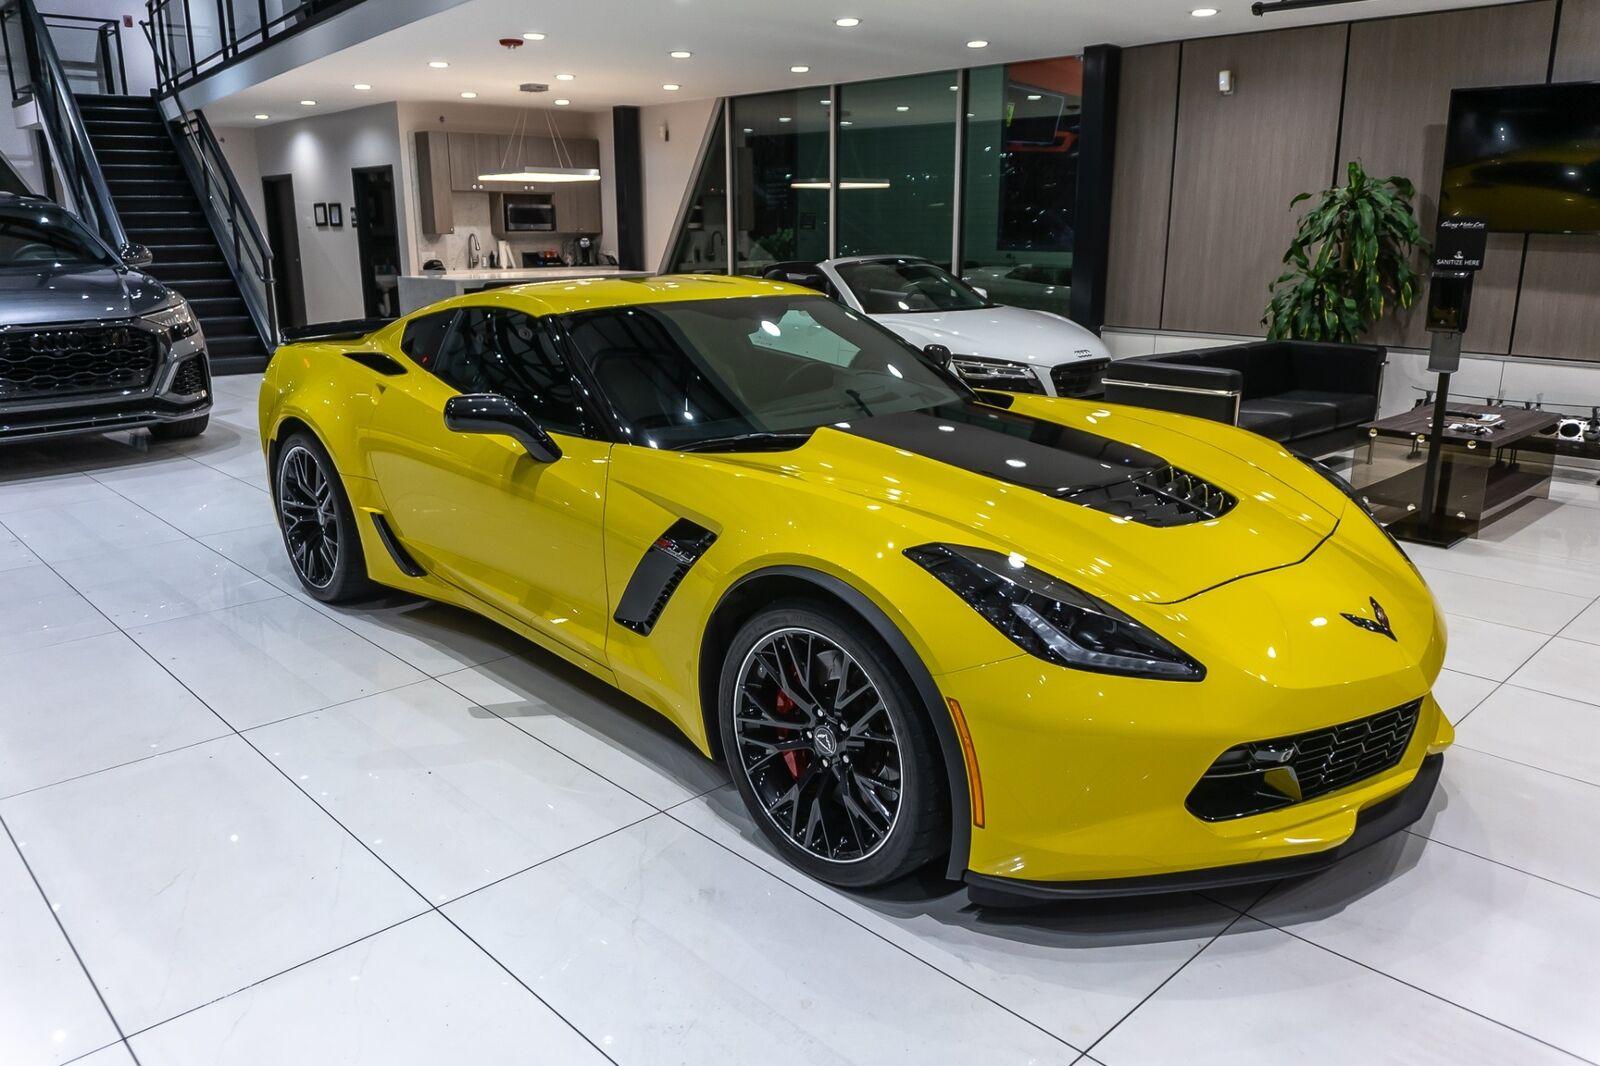 2016 Yellow Chevrolet Corvette Coupe 2LZ   C7 Corvette Photo 6